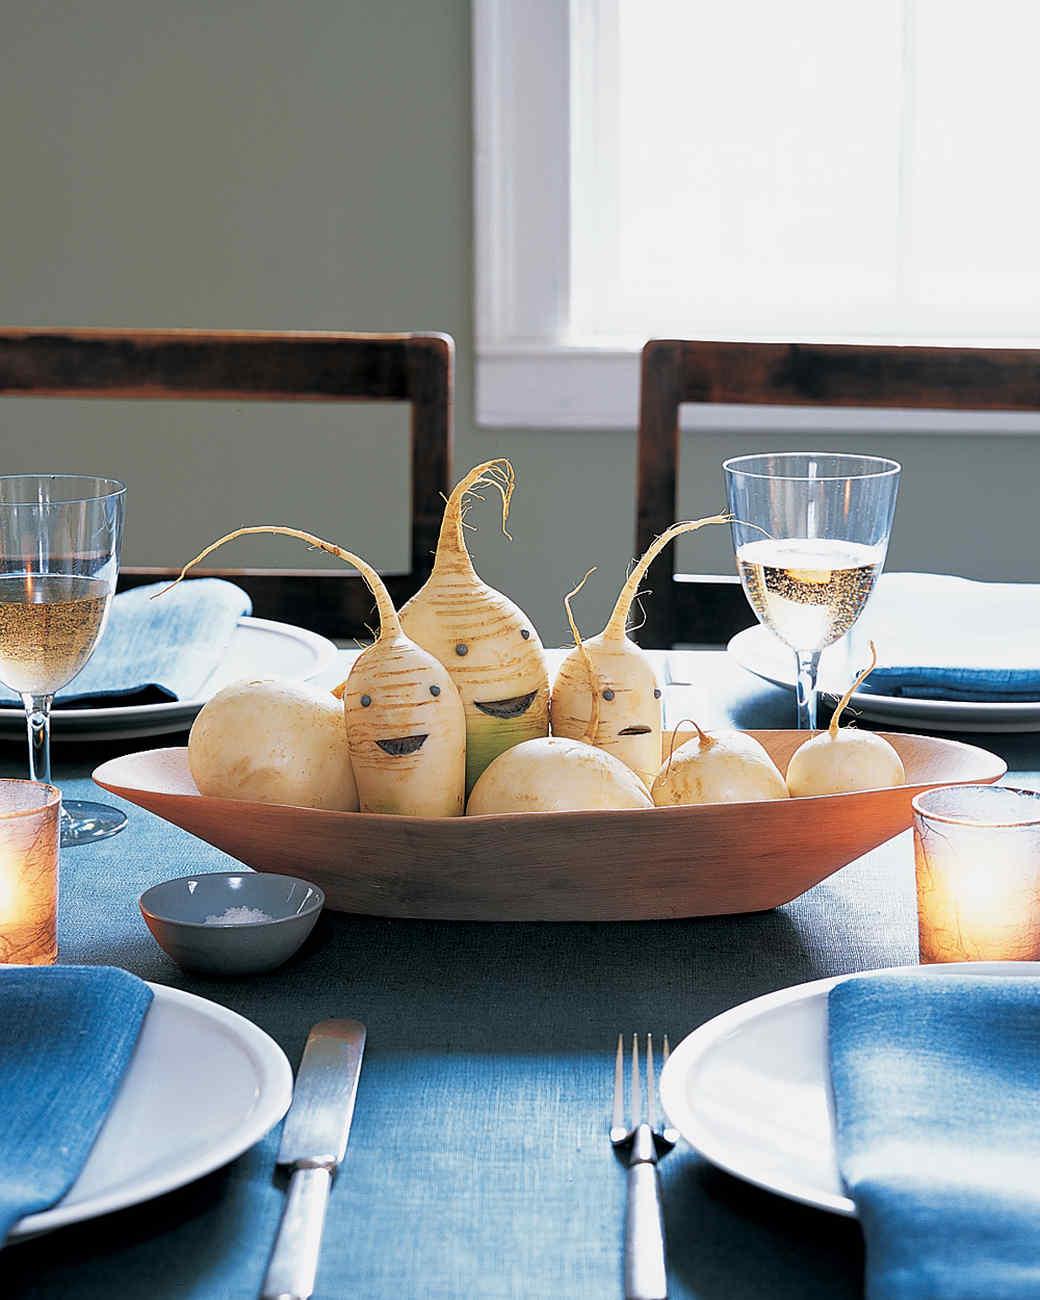 Halloween Centerpieces And Tabletop Ideas Martha Stewart - Martha stewart dining room table